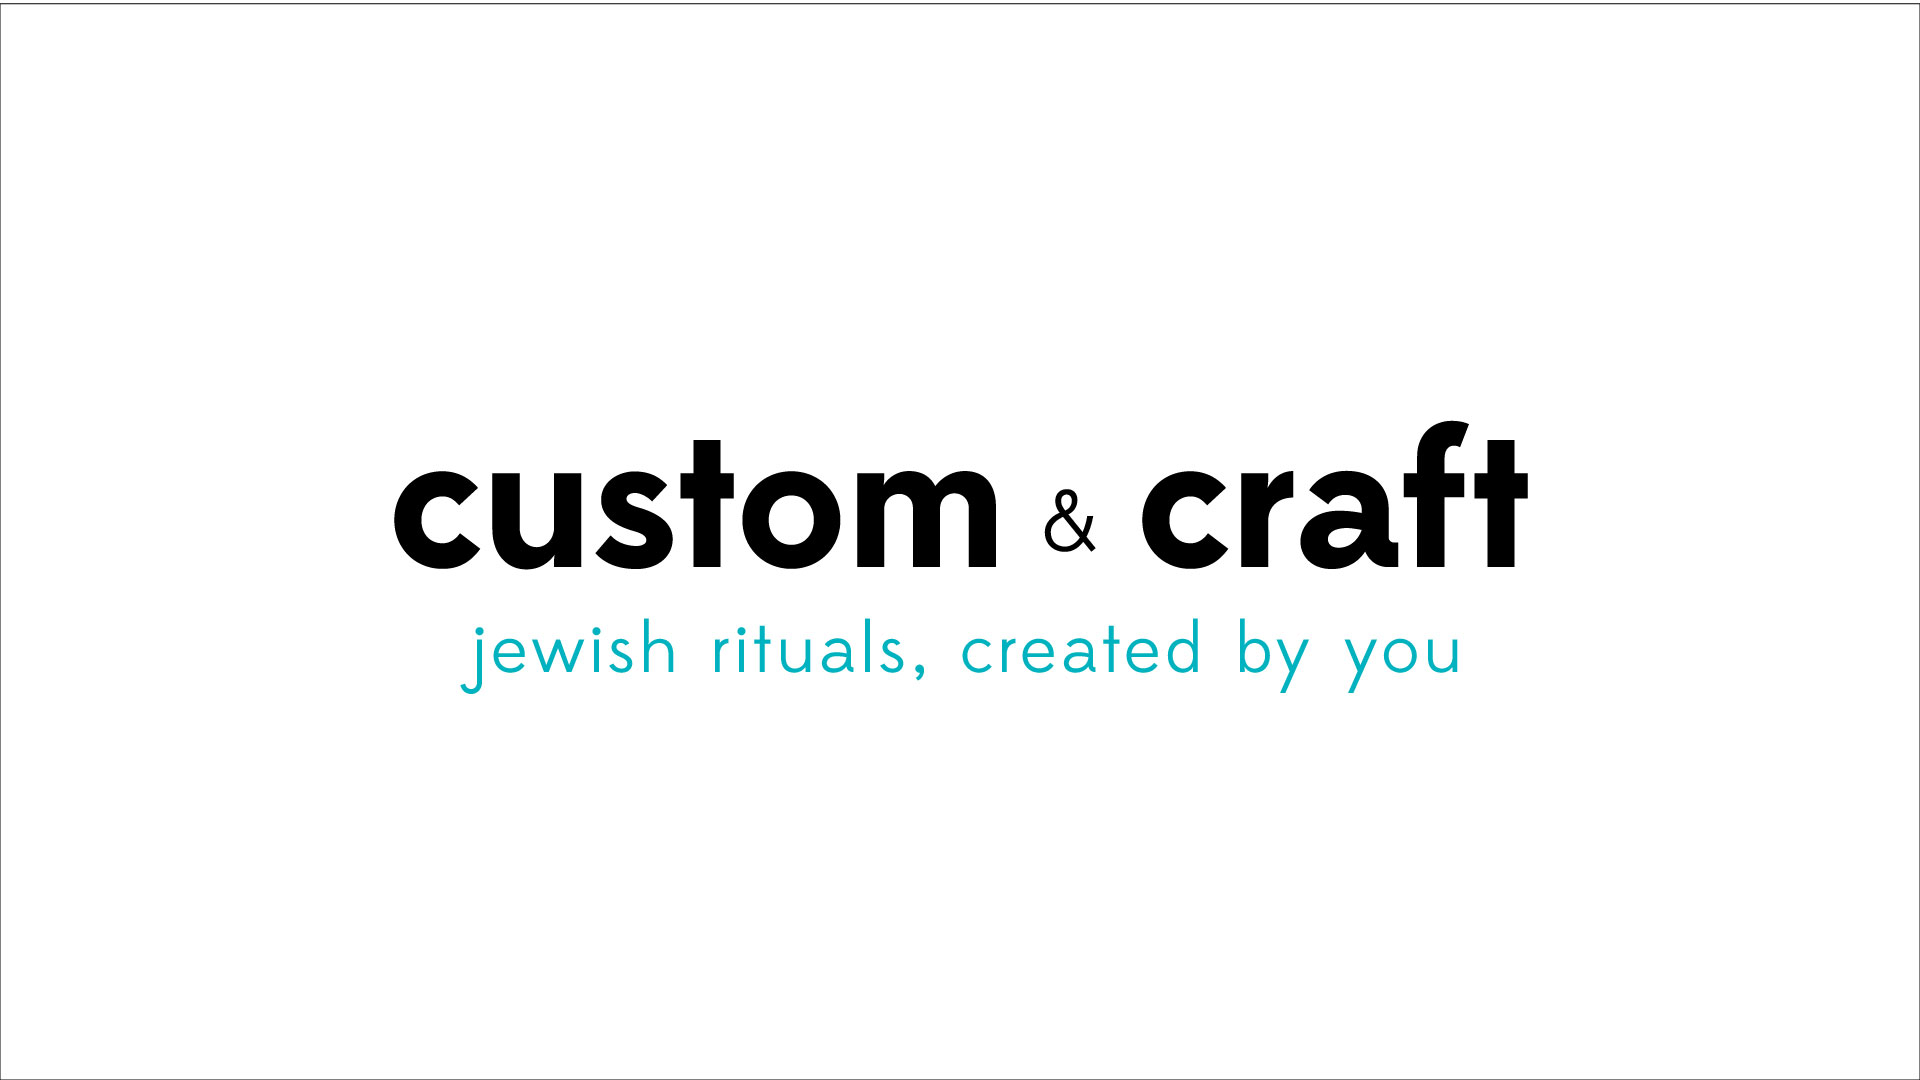 customandcraft.jpg